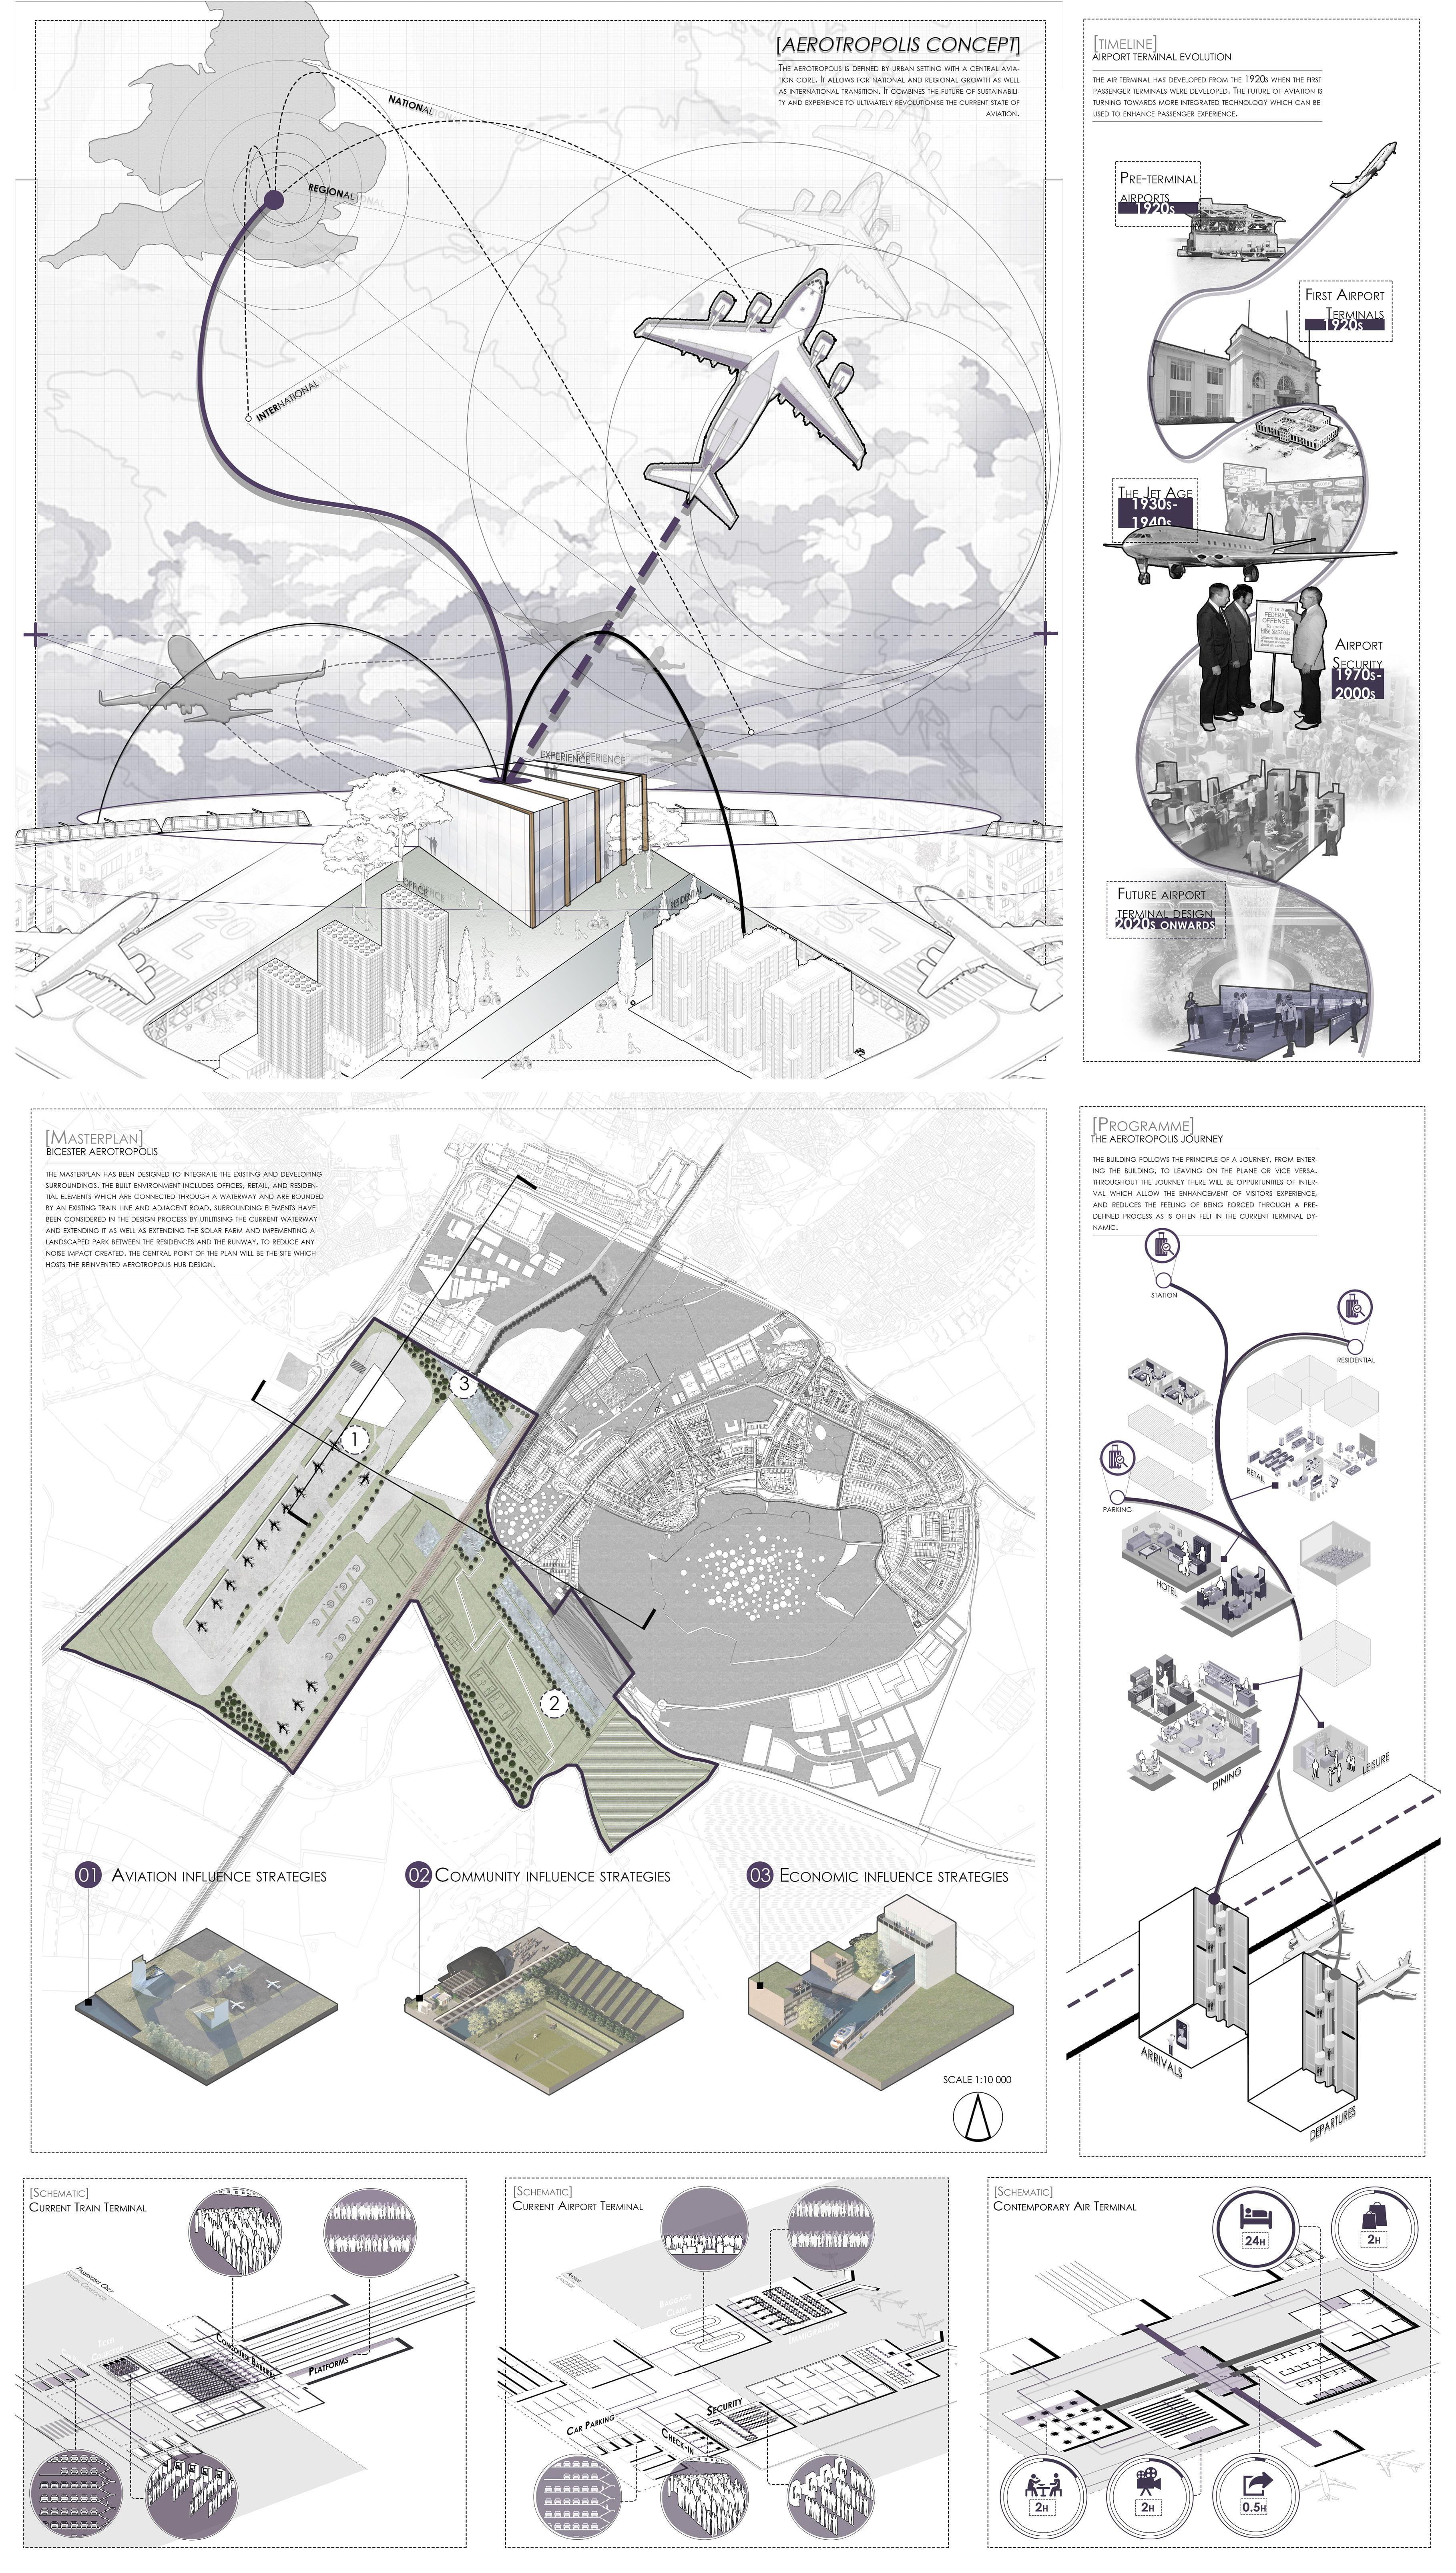 Concept of new terminal design.